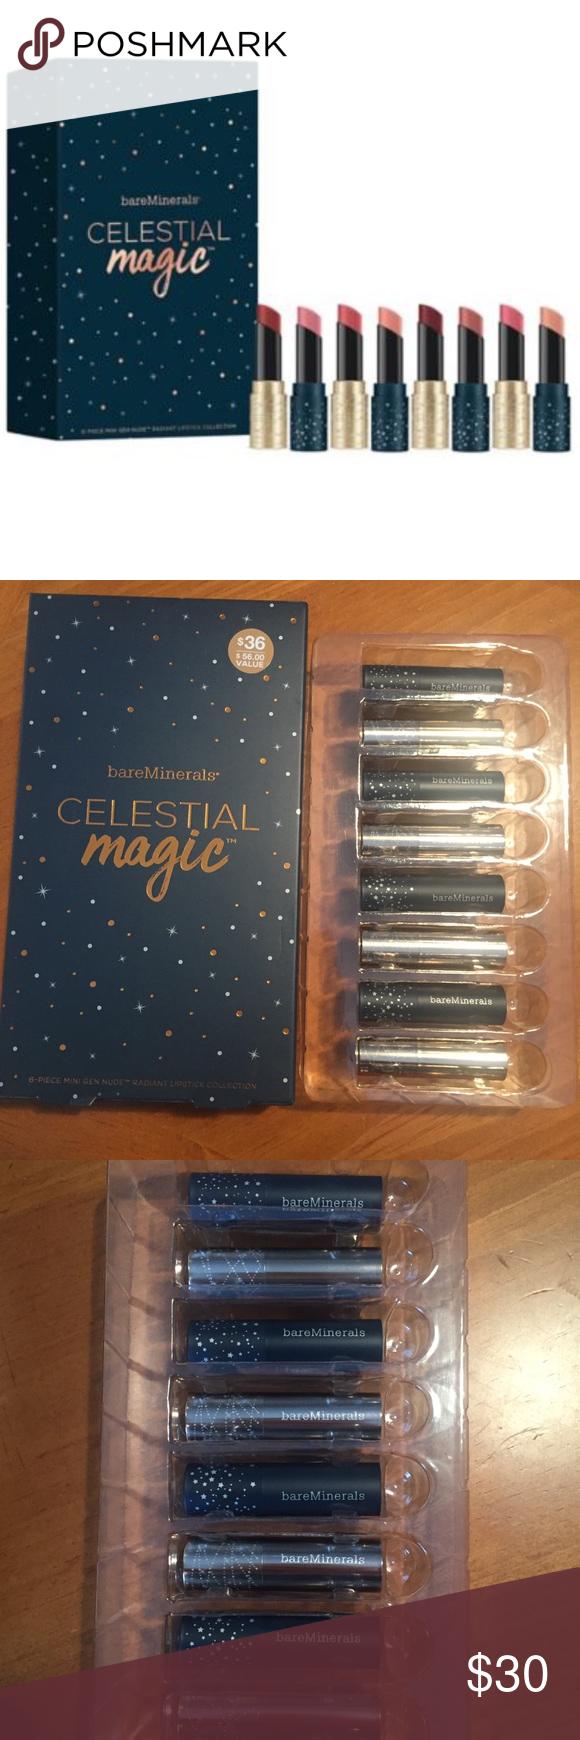 BareMinerals - CELESTIAL Magic 8 Piece Mini Gen Nude